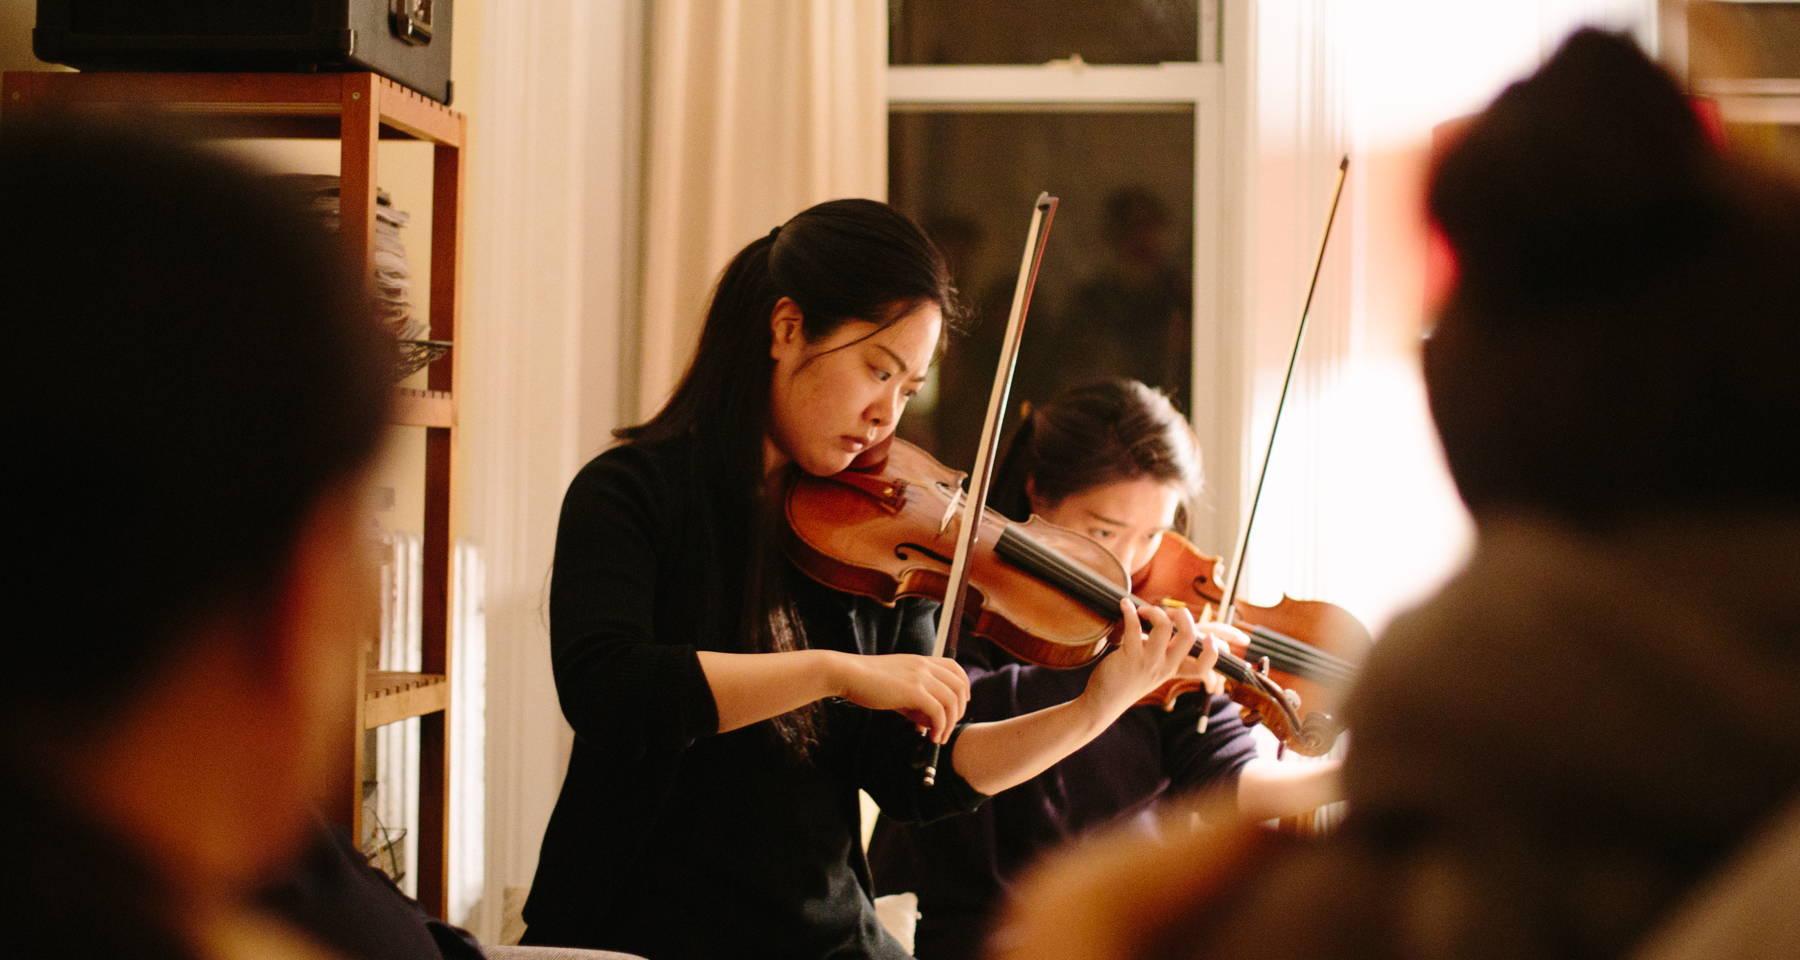 Violin/piano duo livestream from Louisville!